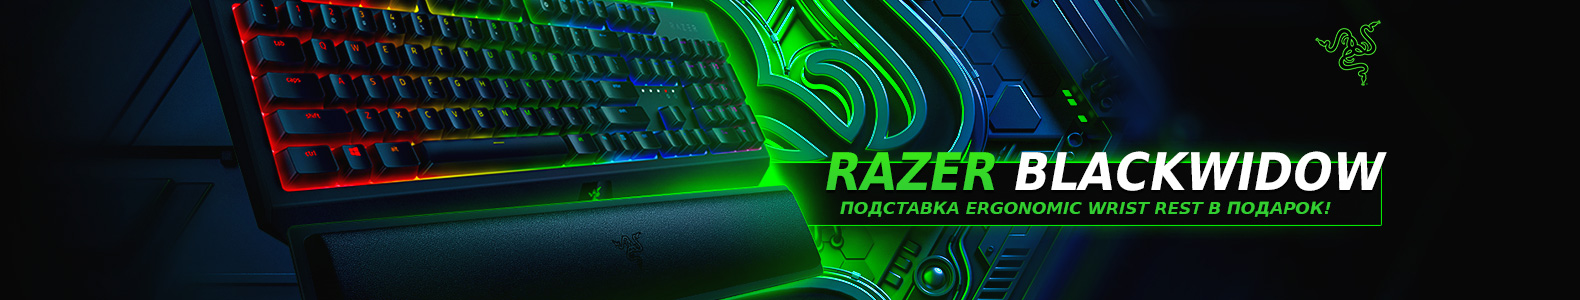 Подарок к клавиатуре Razer BlackWidow